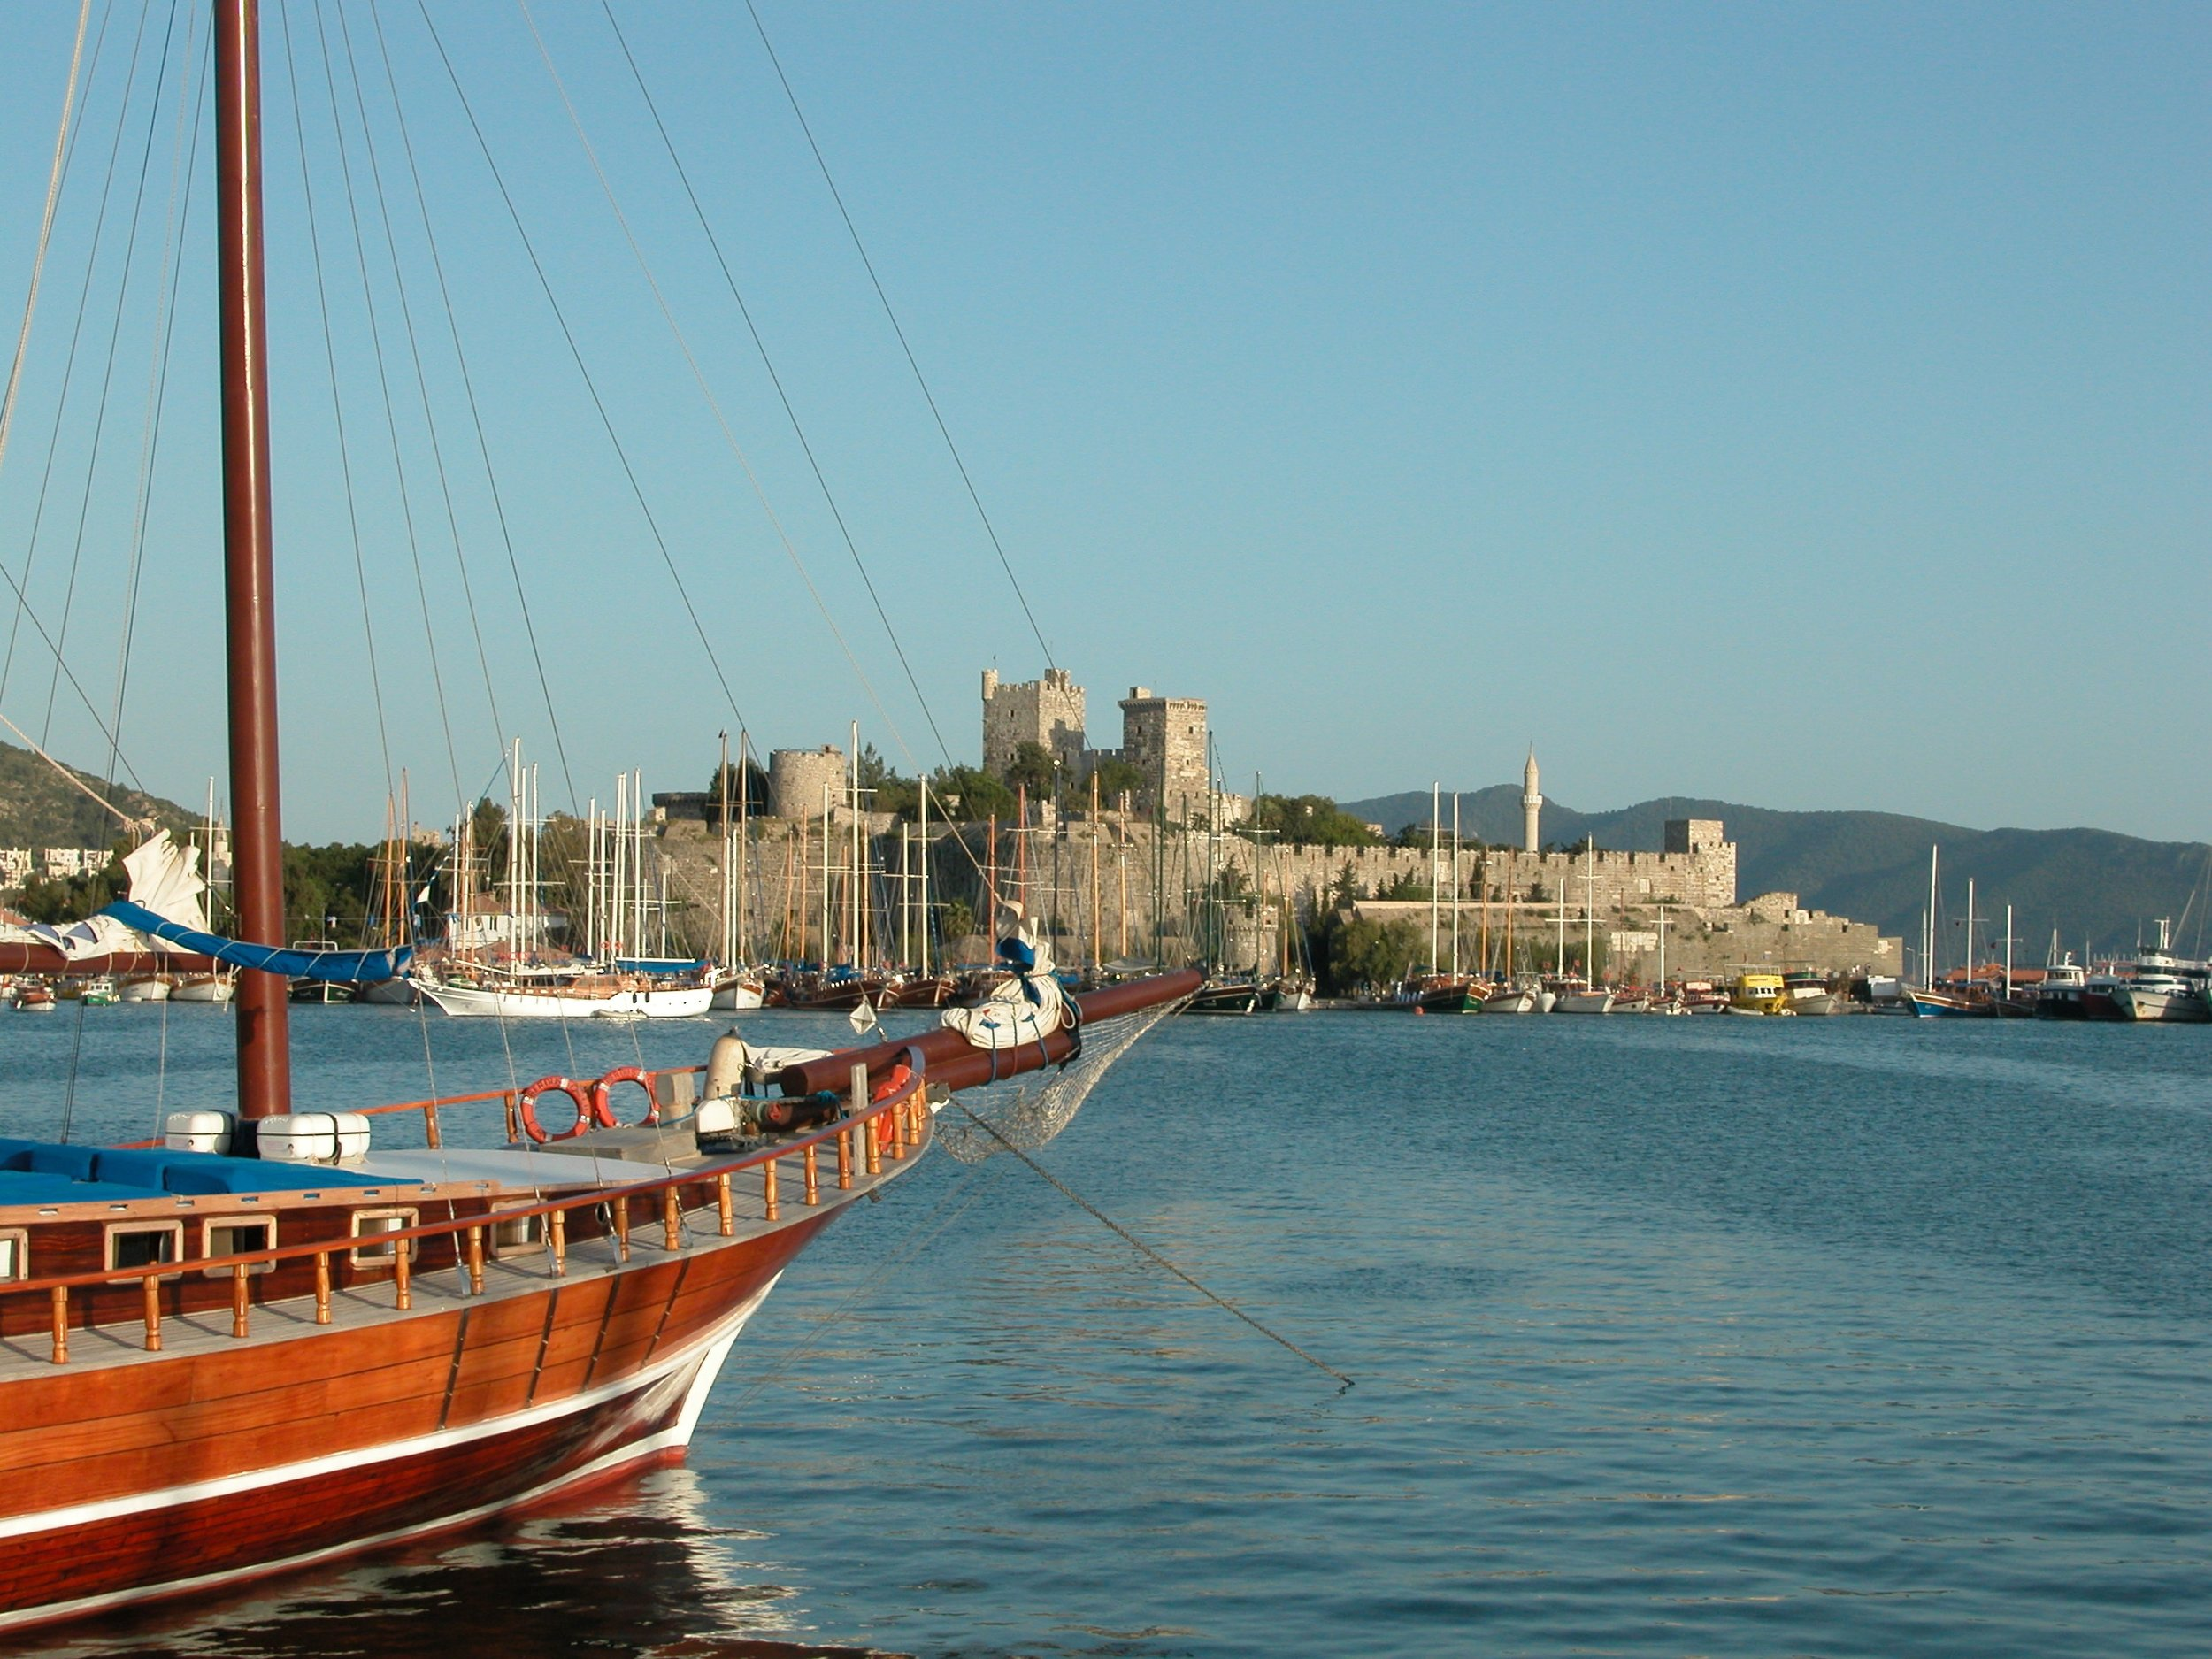 boat3 Turkey tbc.jpg